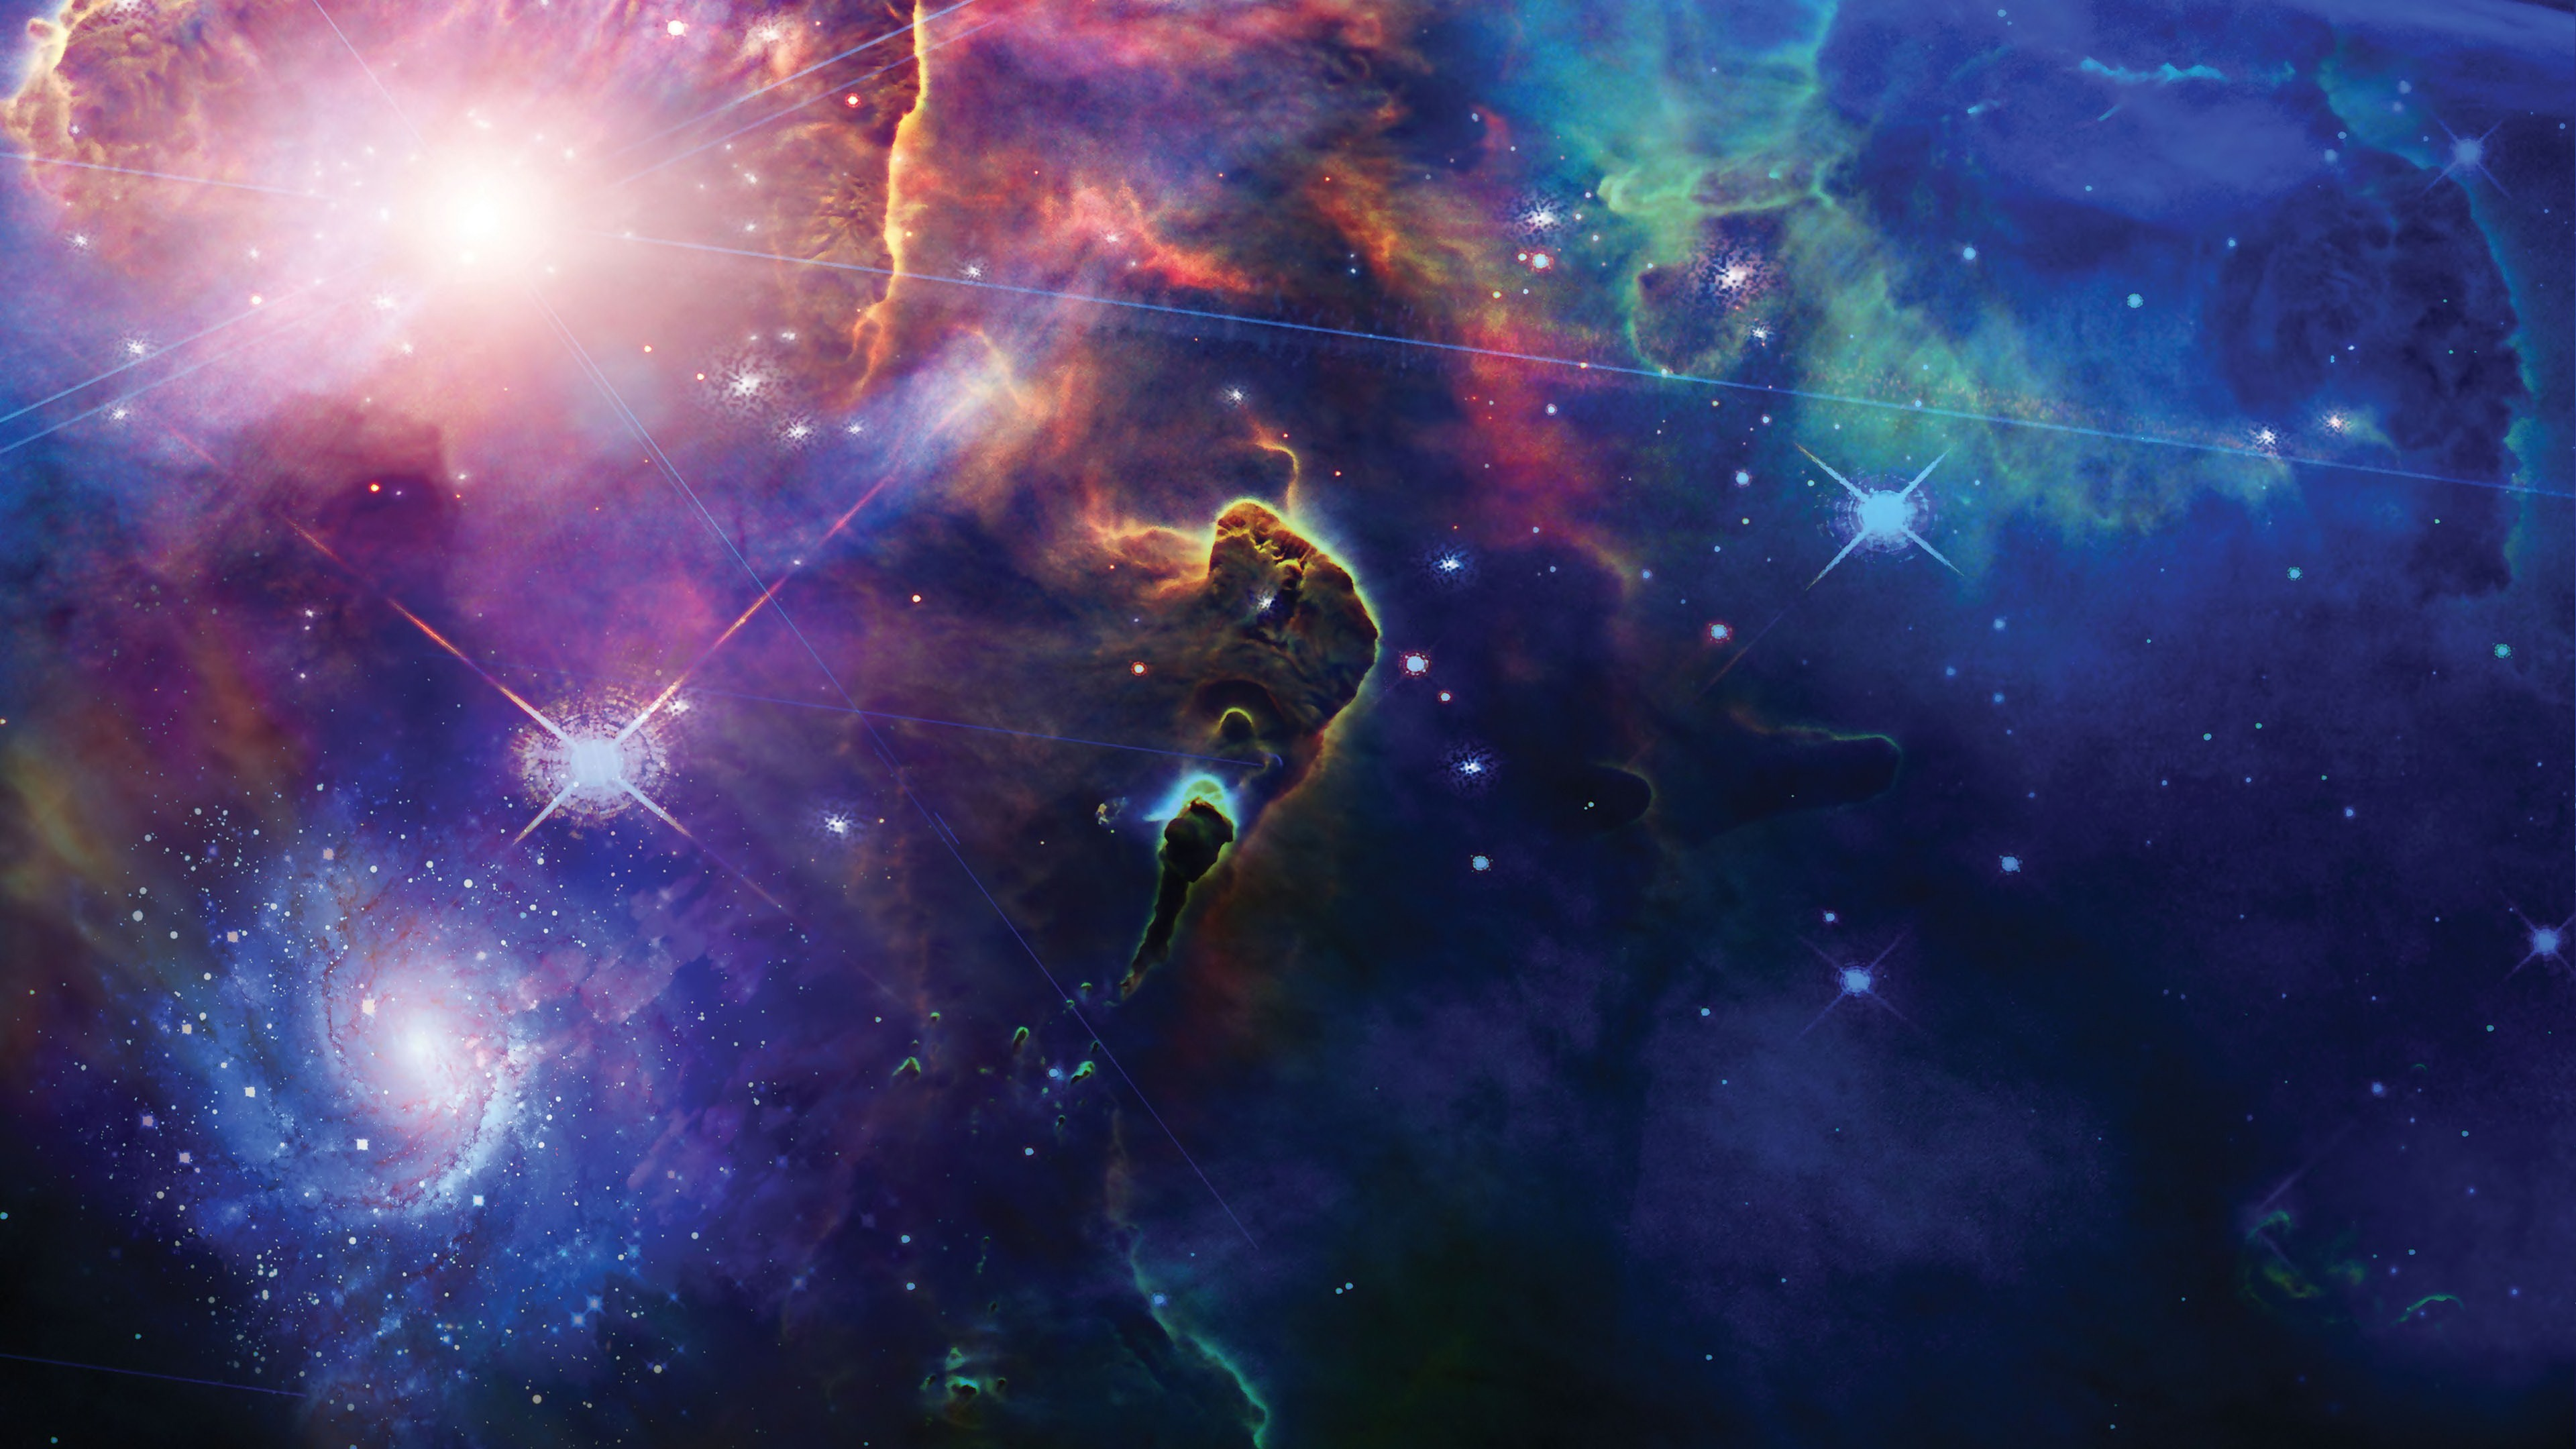 Galaxy Wallpaper 4K (48+ images)